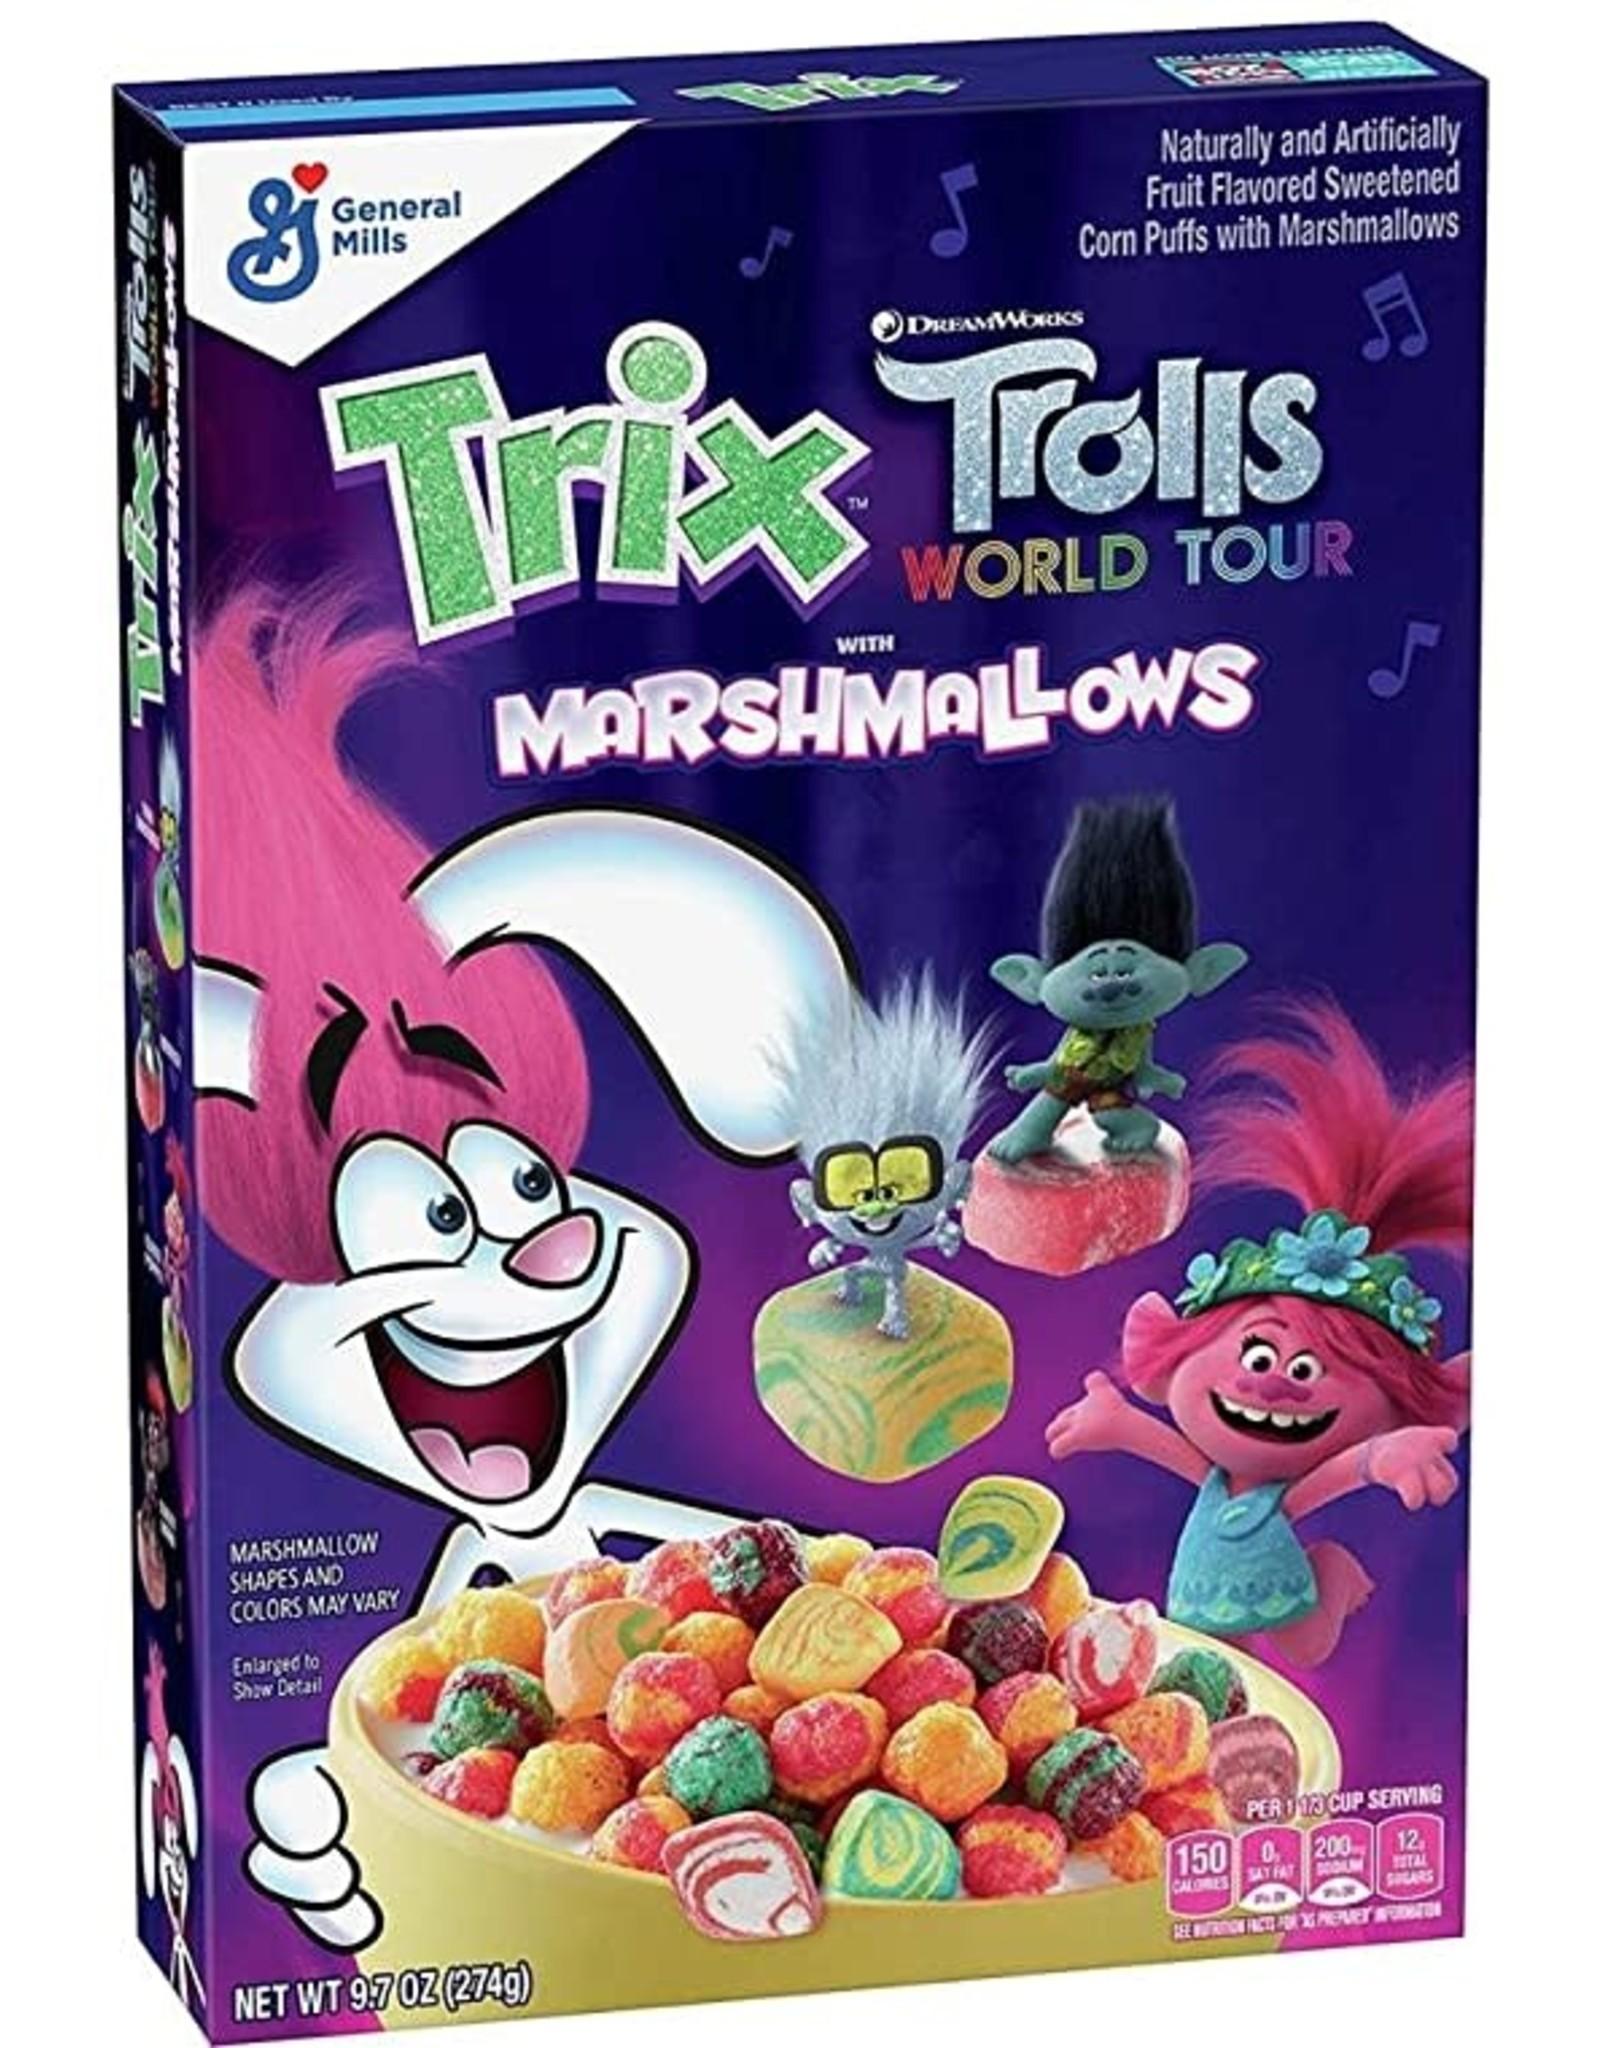 Trix Trolls World Tour with Marshmallows - 274g